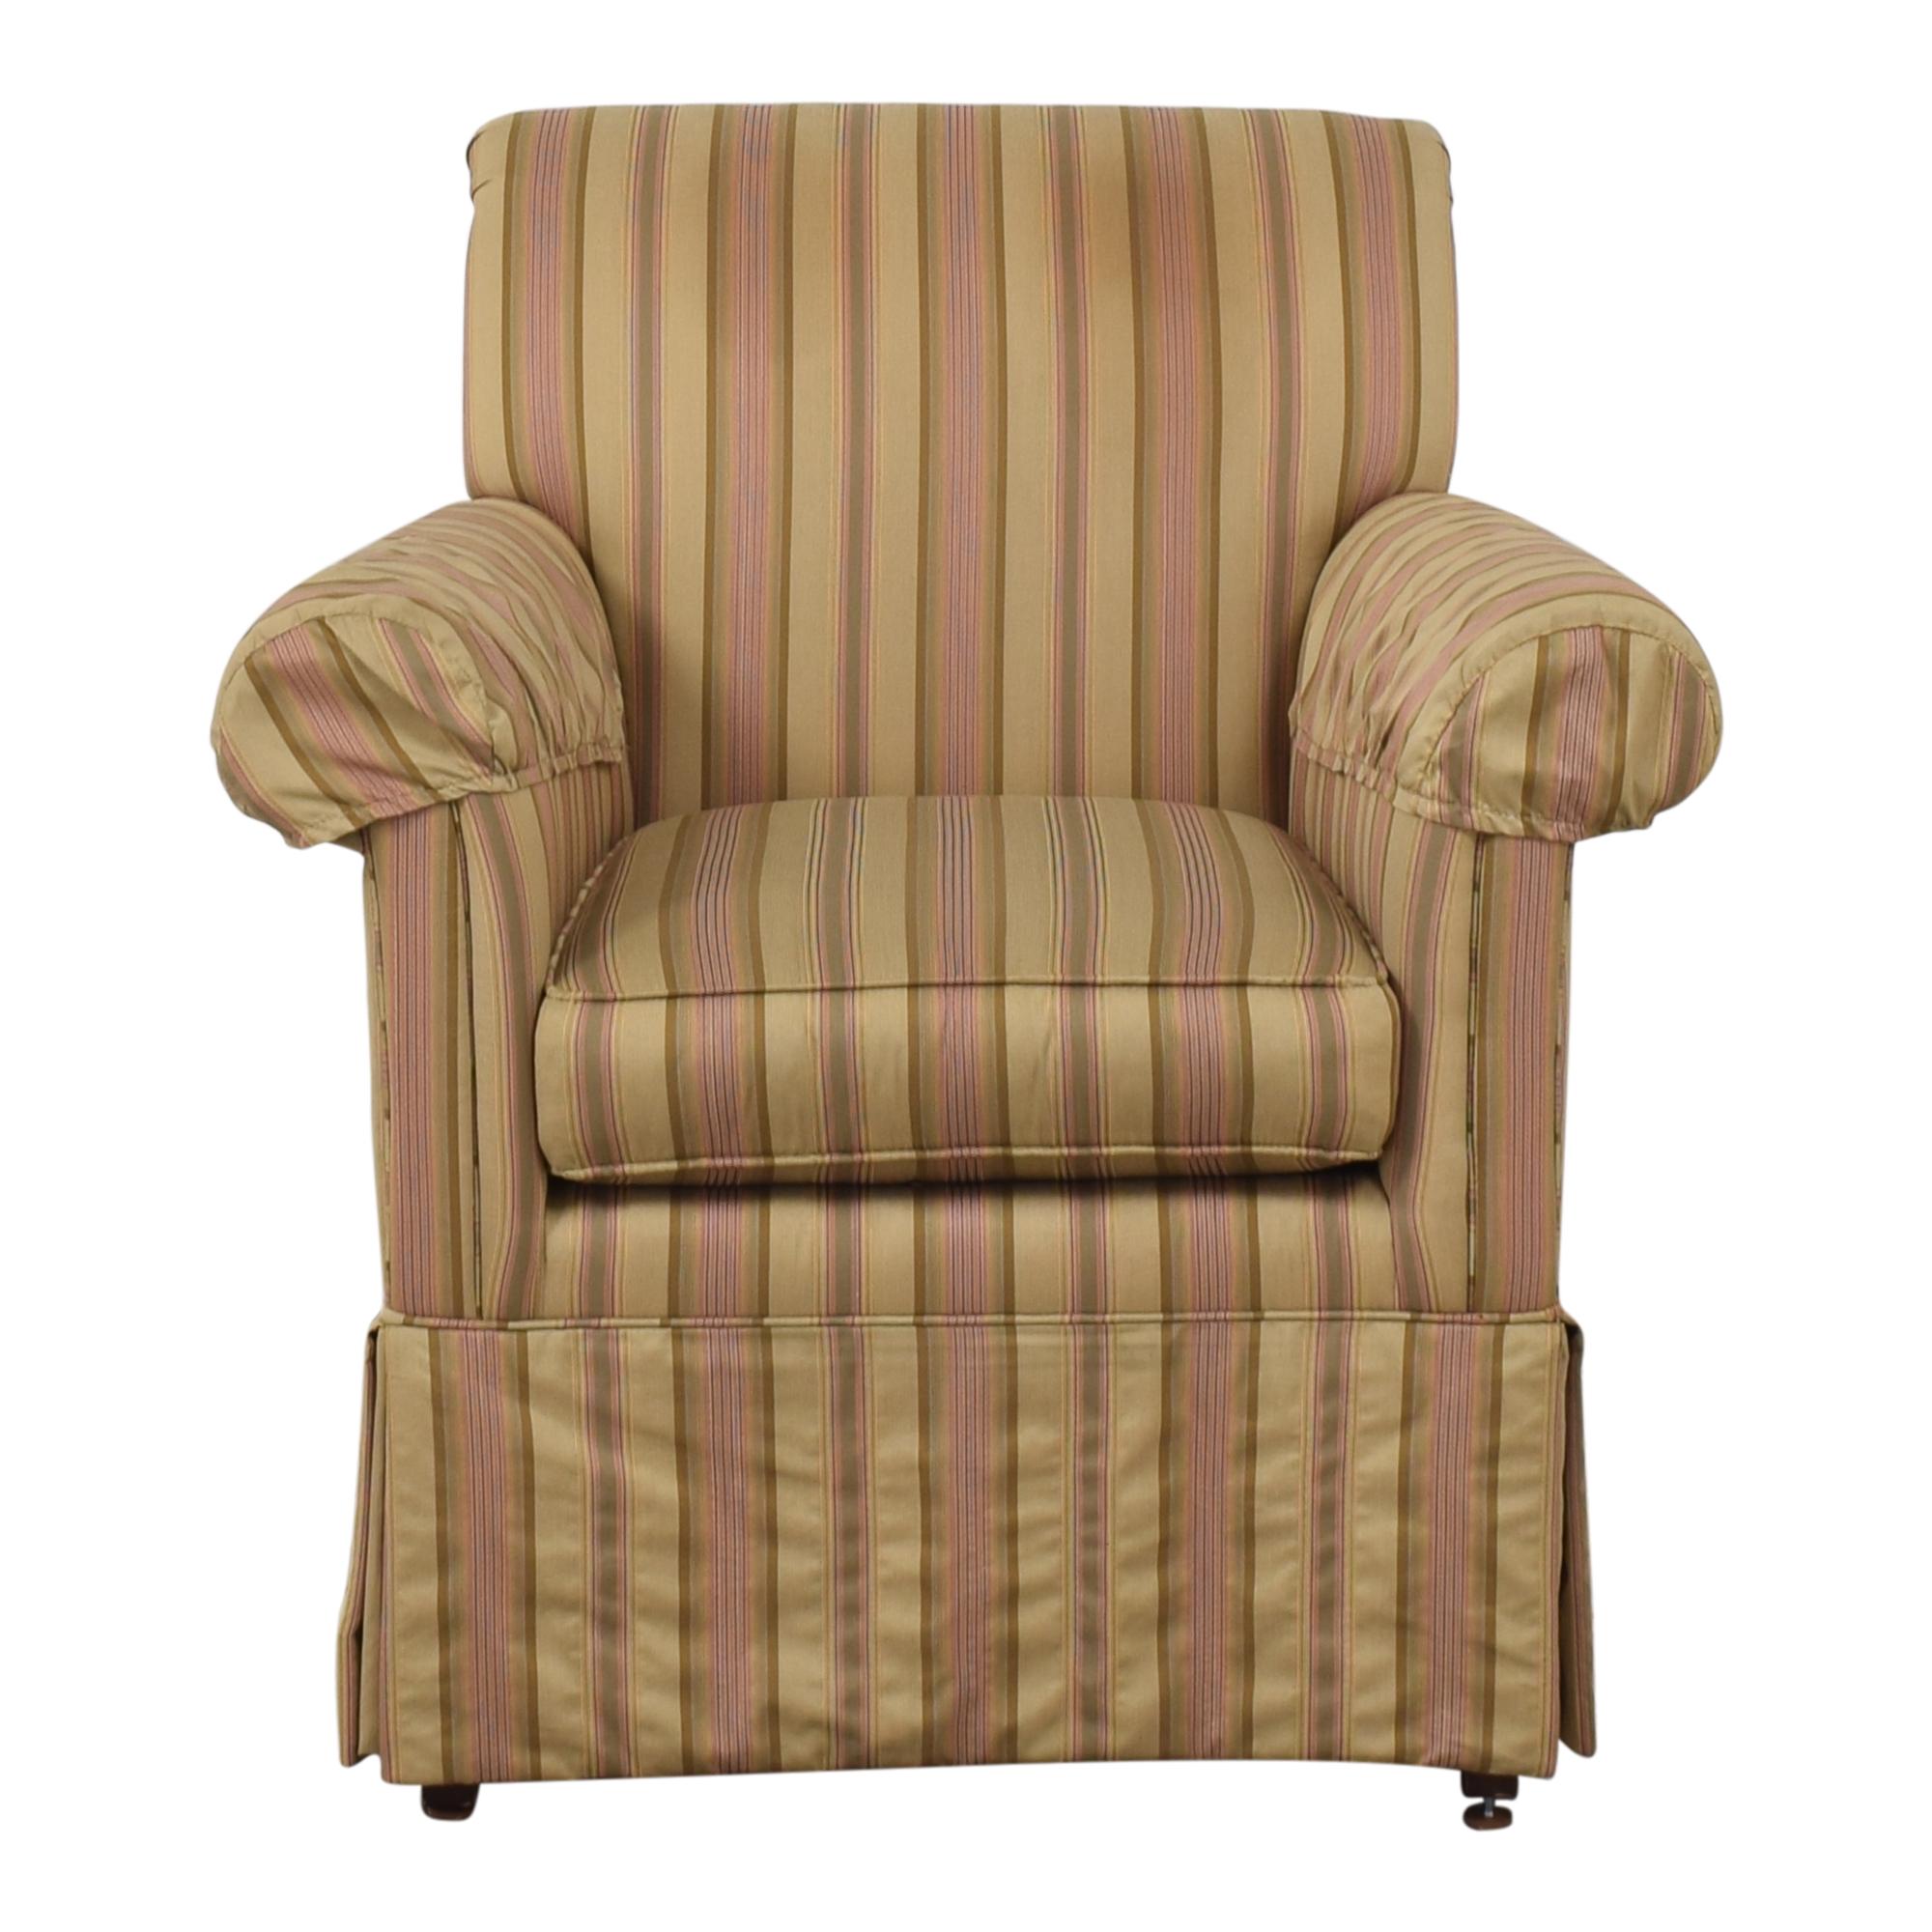 Ethan Allen Striped Accent Chair Ethan Allen